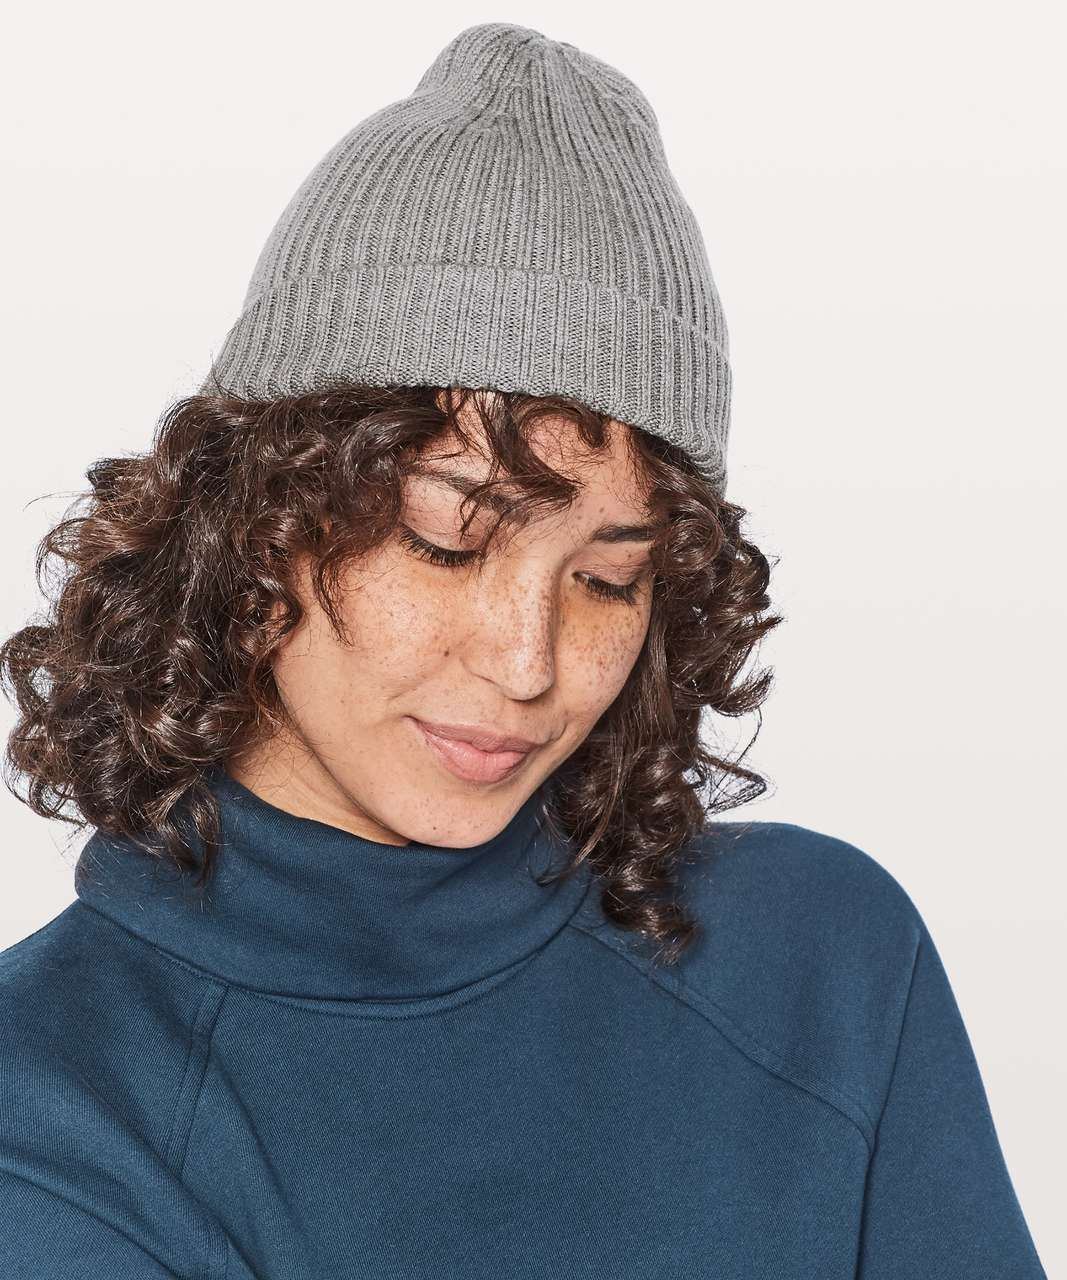 Lululemon Wool Be Cozy Toque - Heathered Core Medium Grey